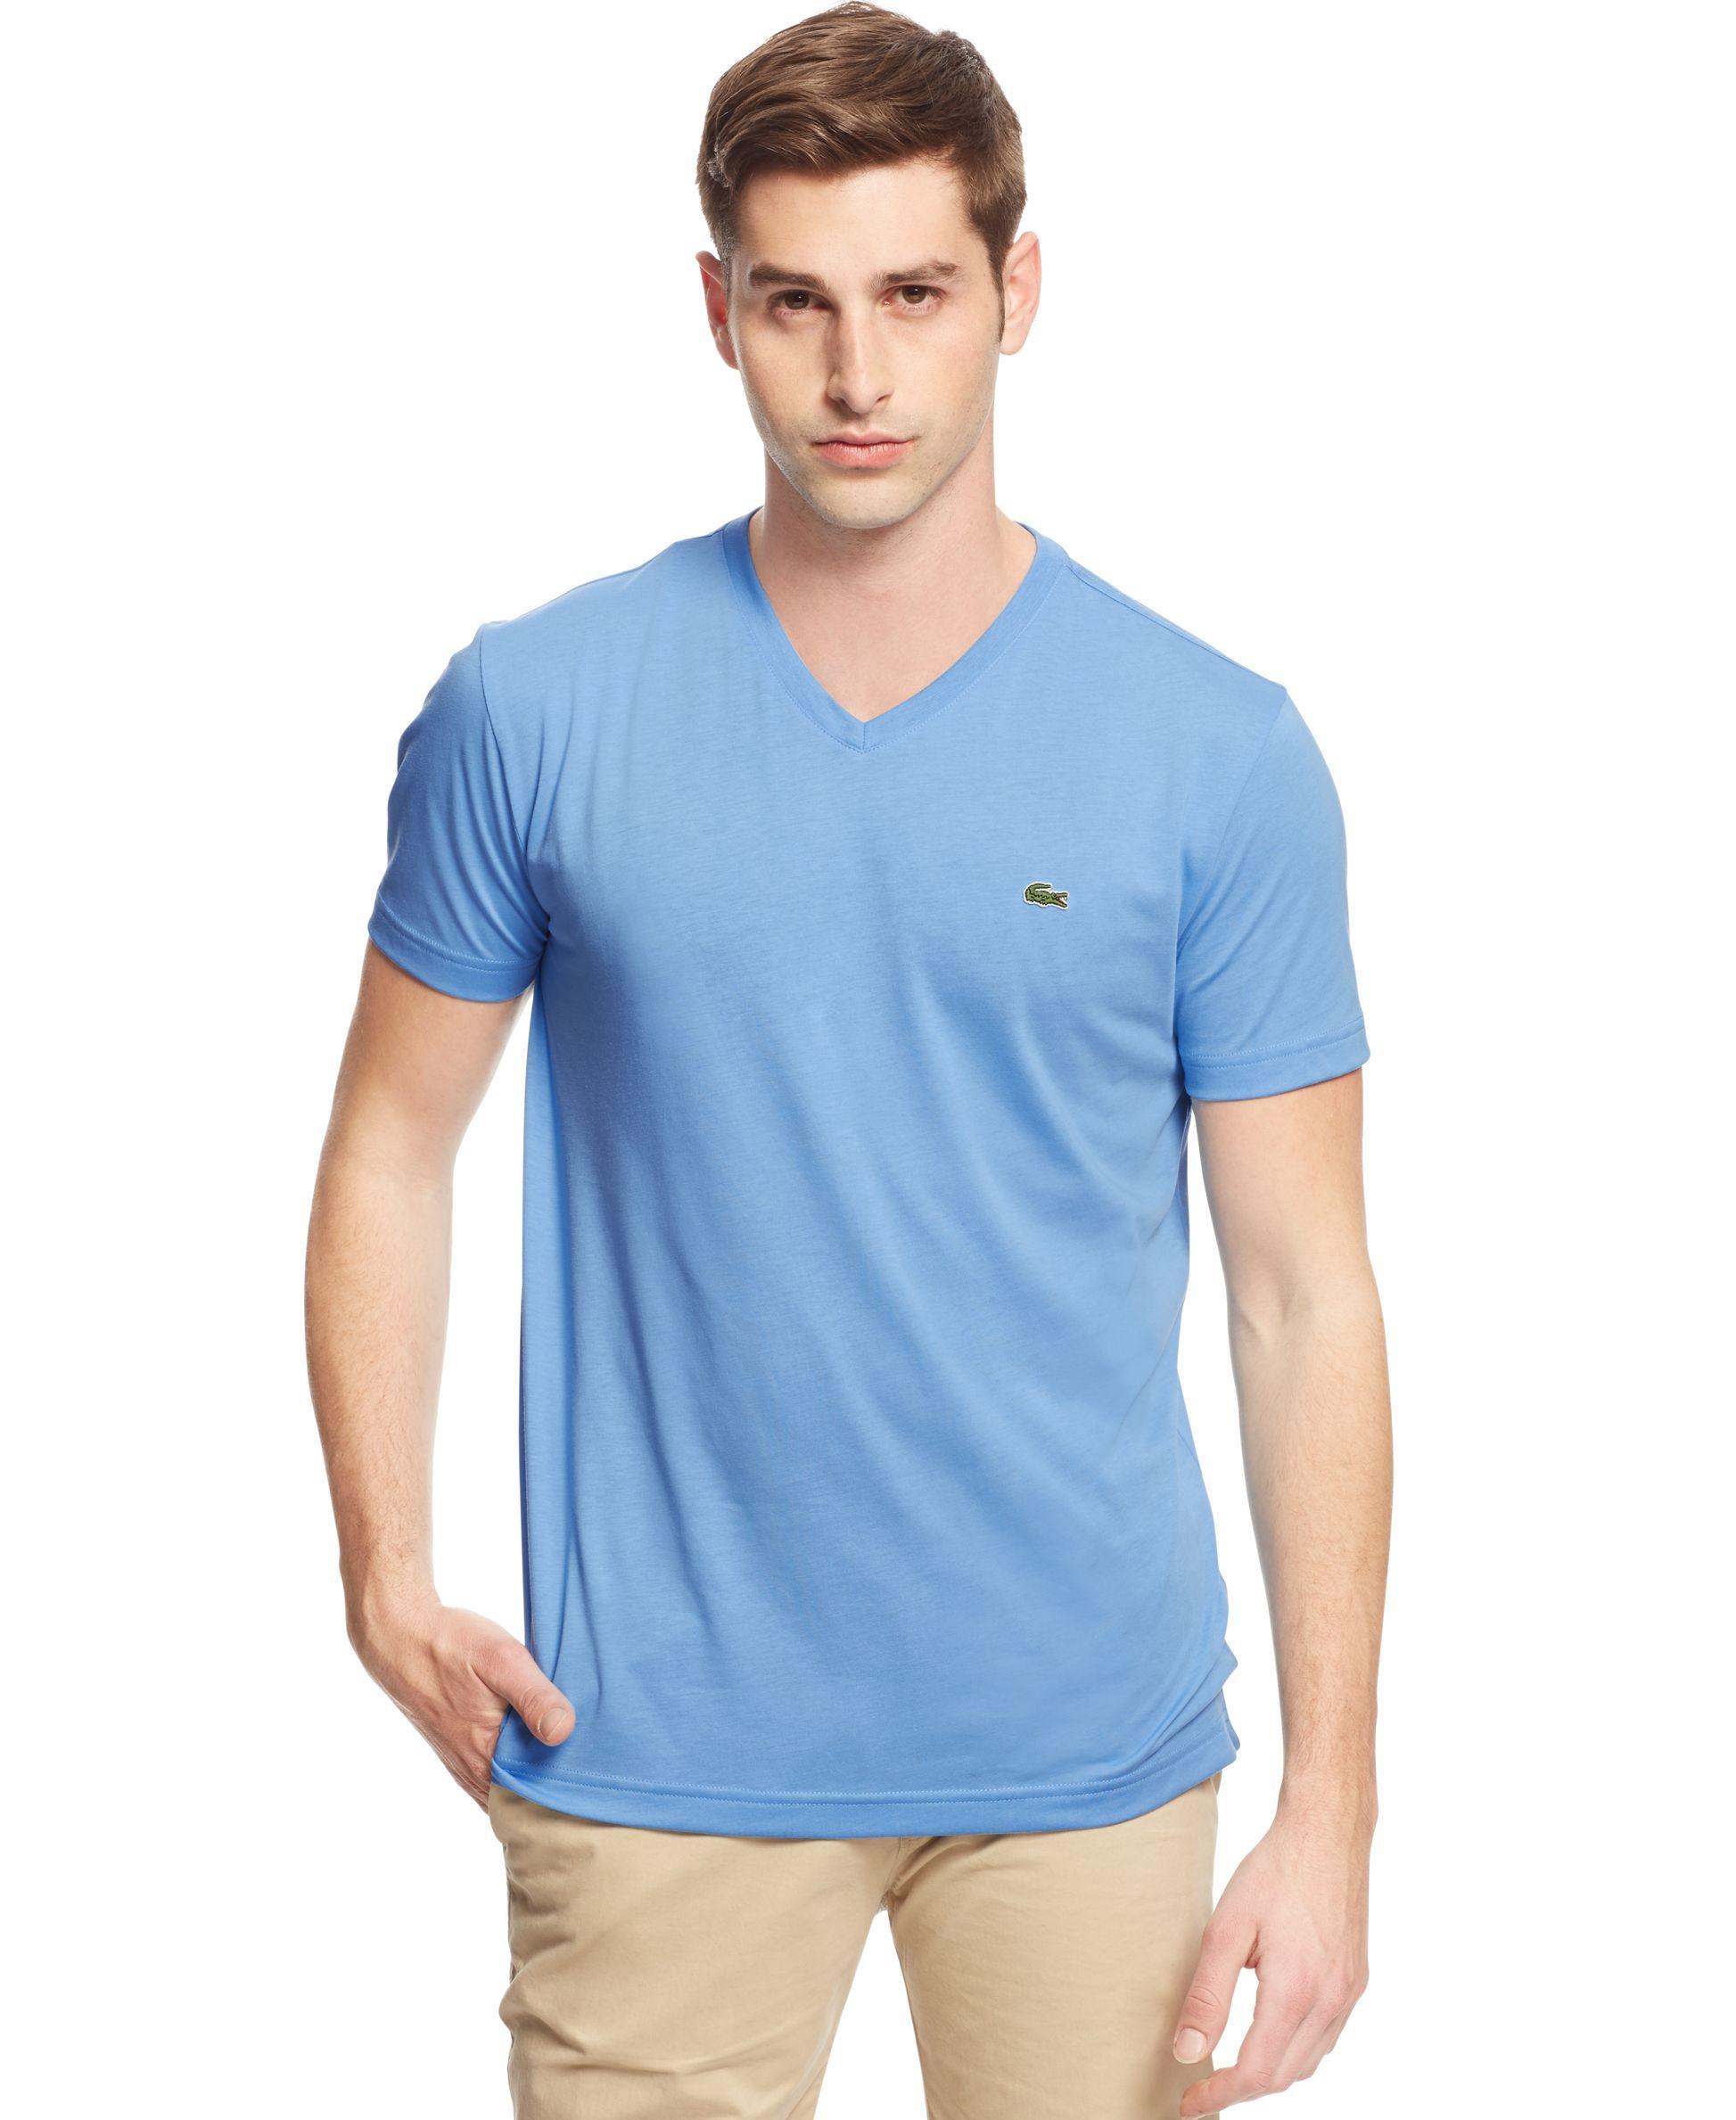 25472c4848 Lacoste Mens Short Sleeve Jersey Pima V Neck T Shirt